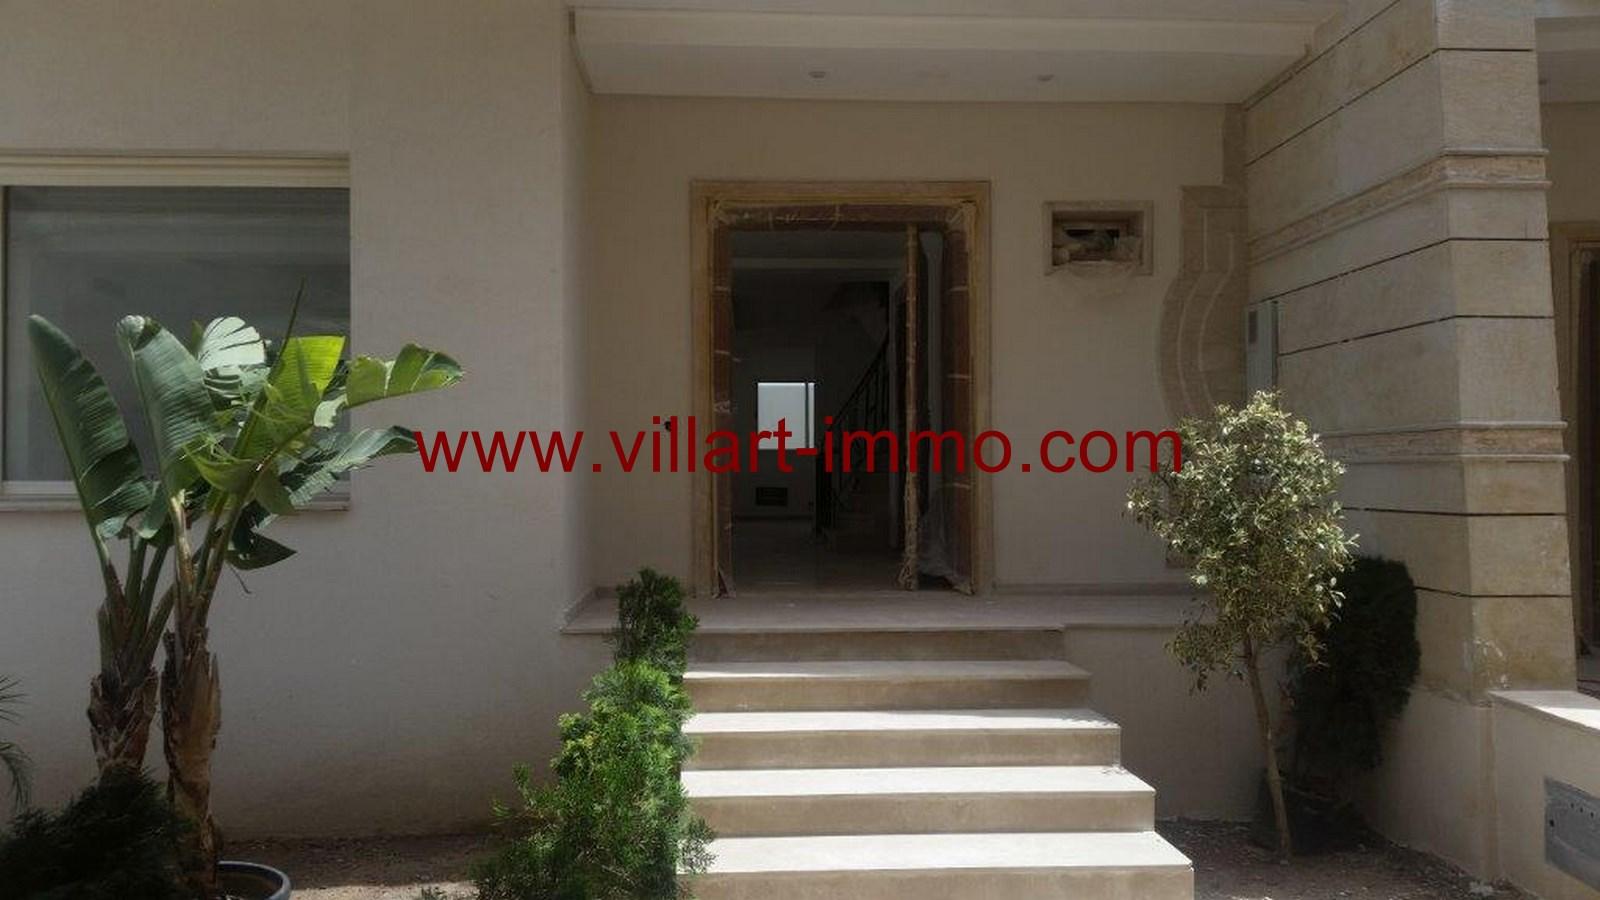 2-a-vendre-tanger-villa-la-montagne-entree-vv421-villart-immo-agence-immobiliere